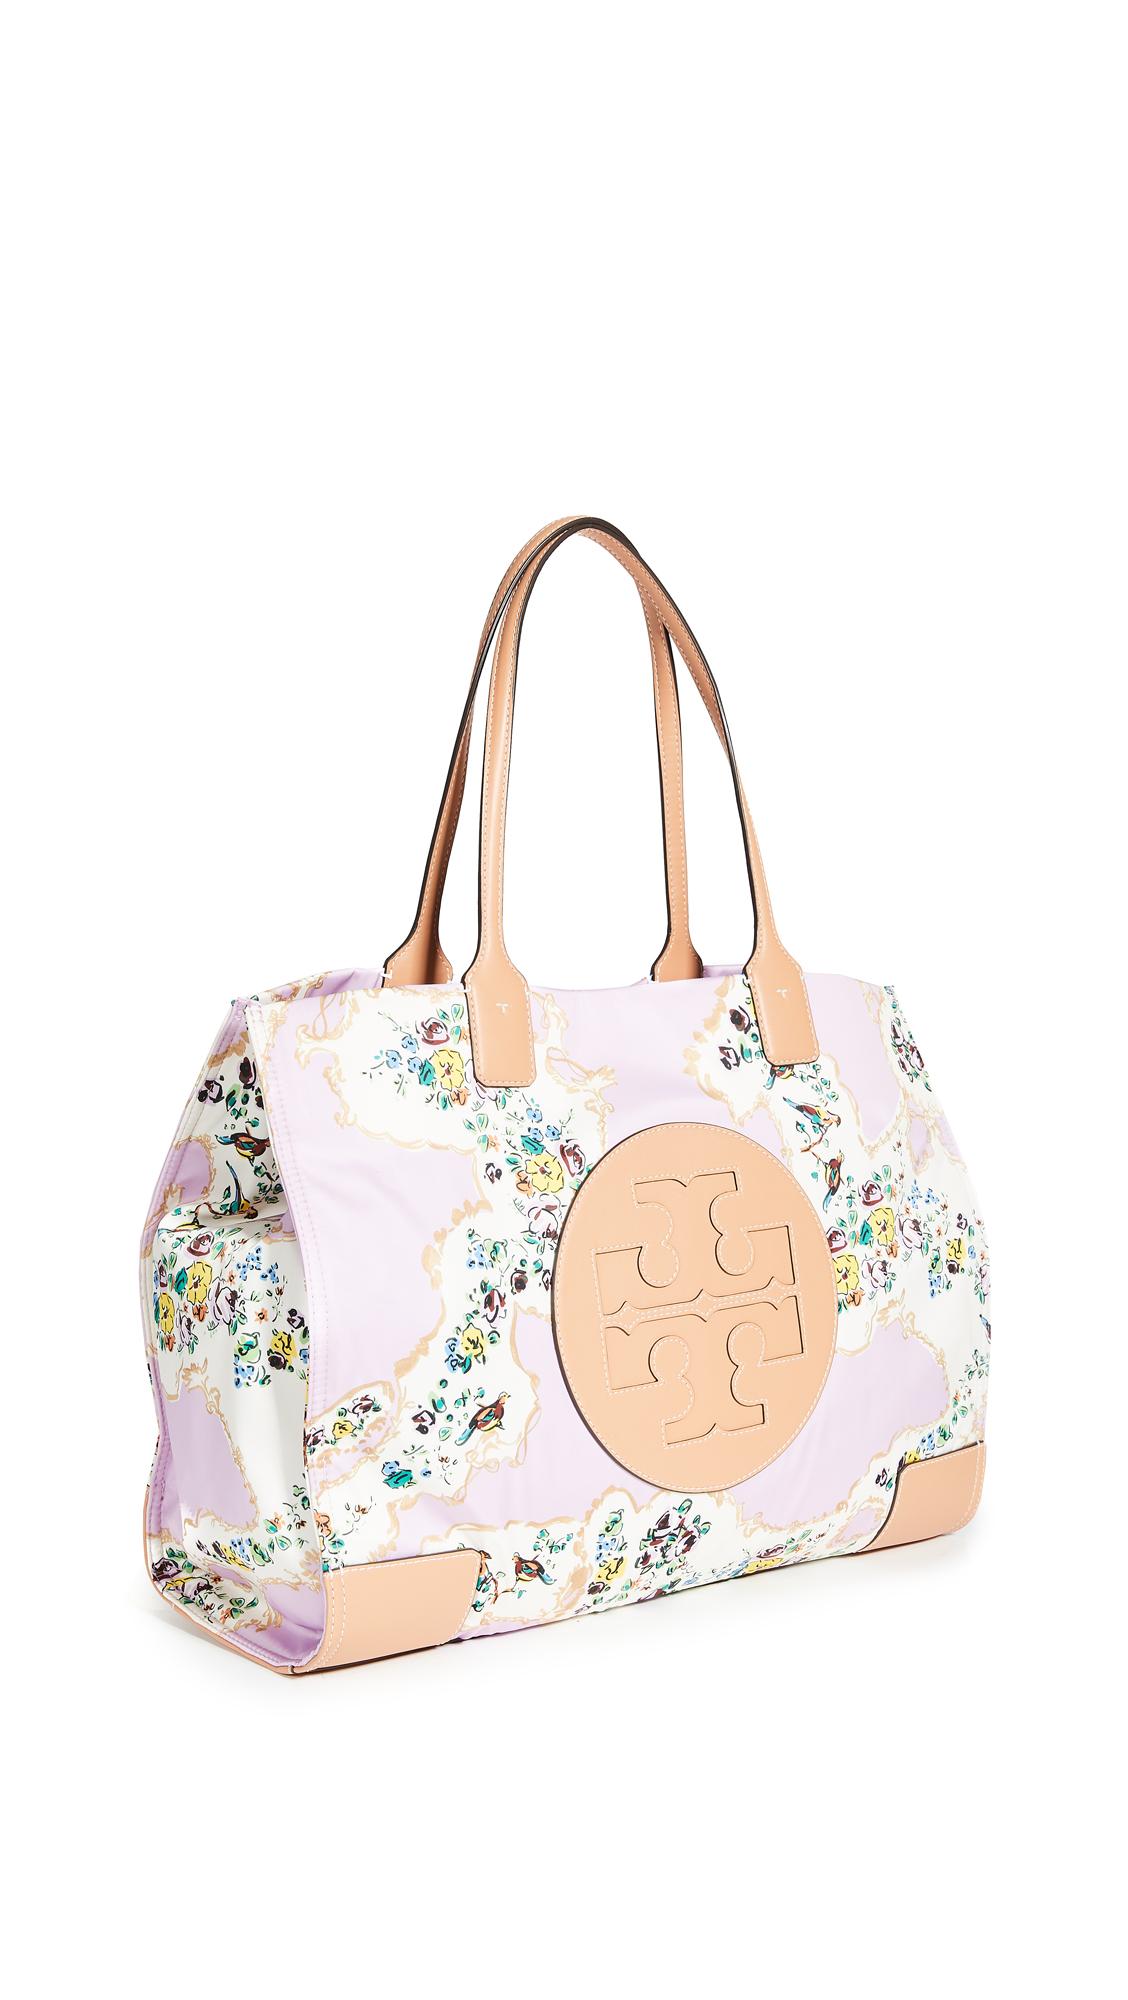 Tory Burch Ella Printed Tote Bag In Pink Porcelain Floral